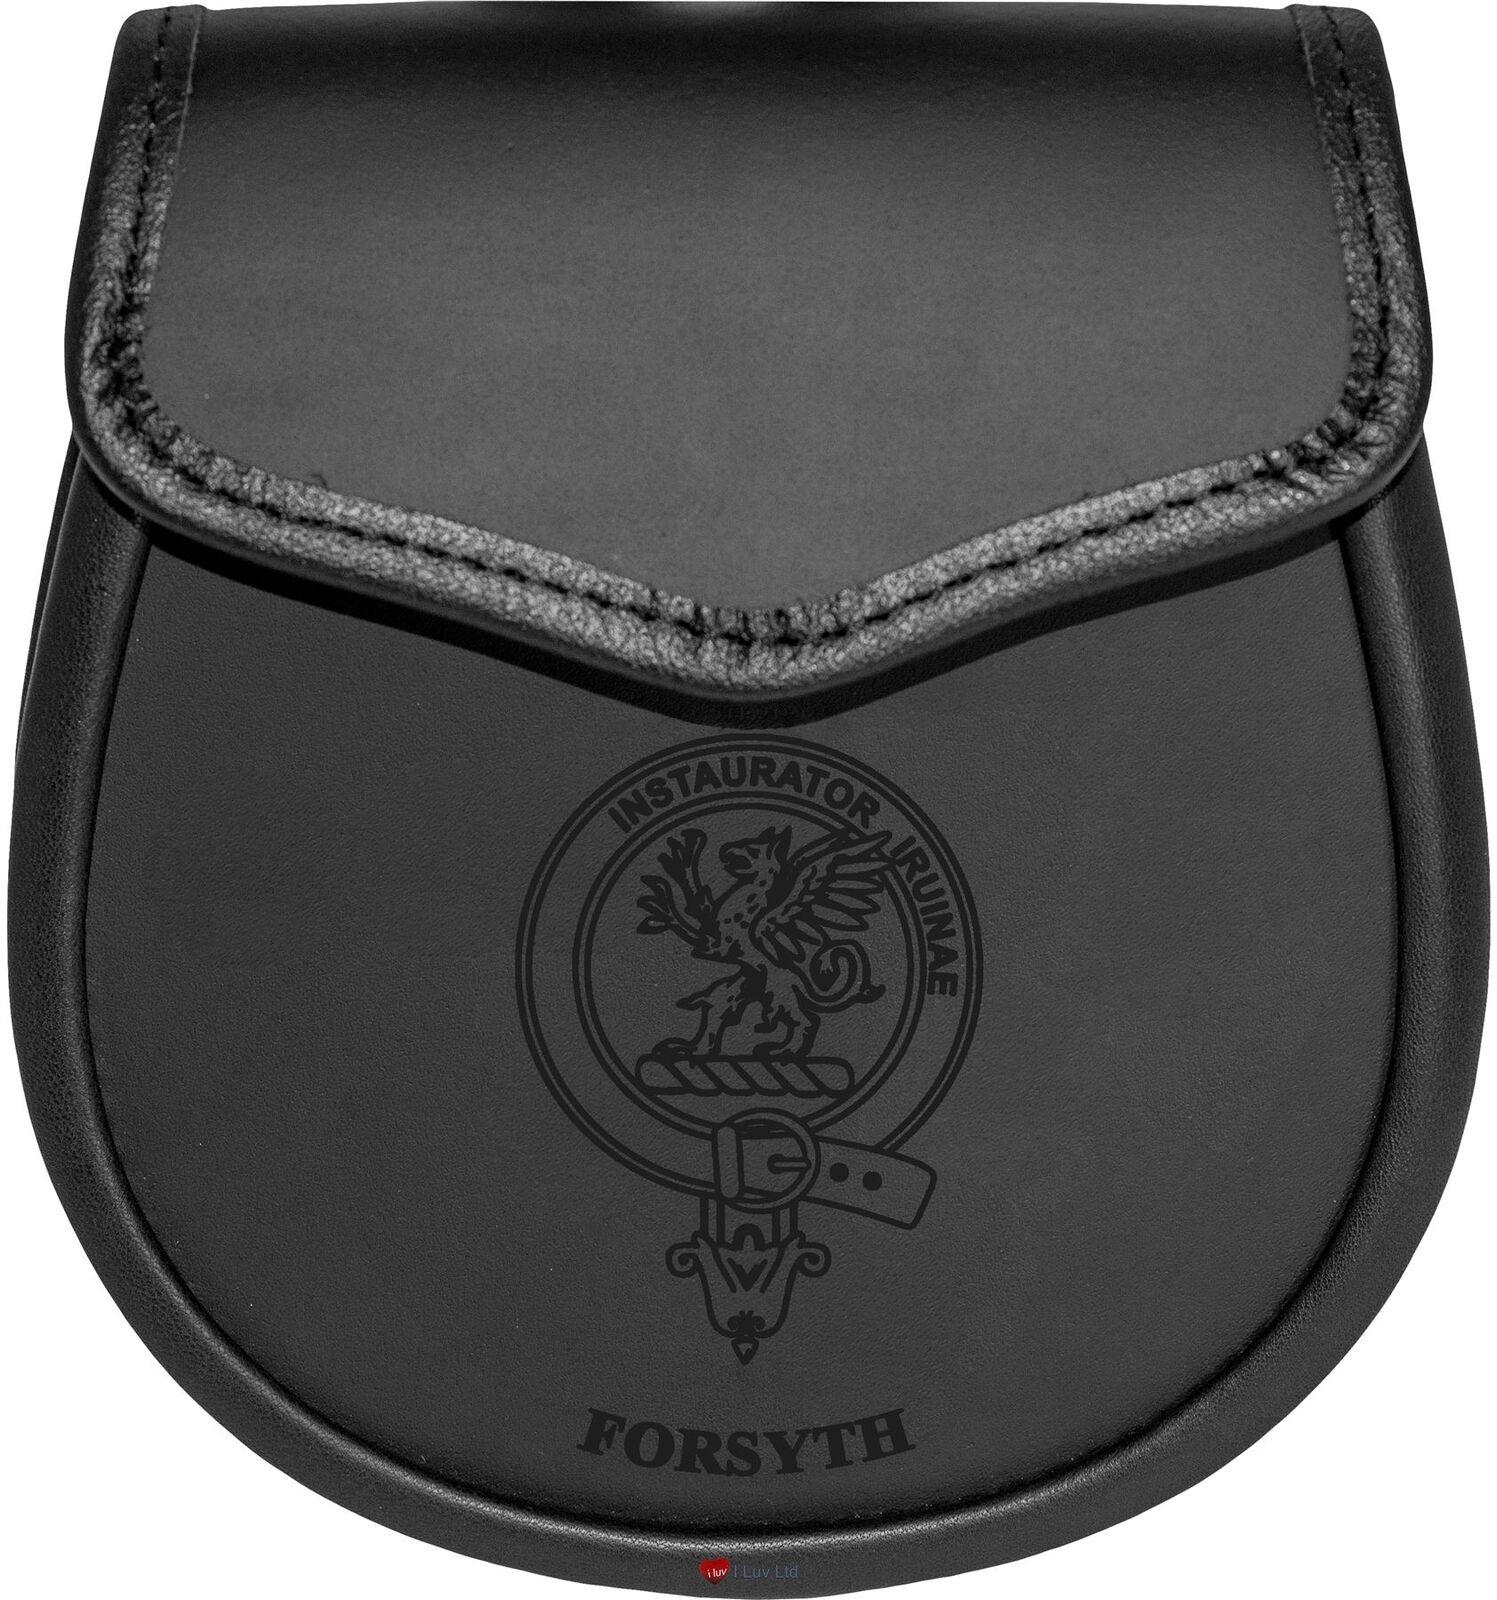 Forsyth Leather Day Sporran Scottish Clan Crest